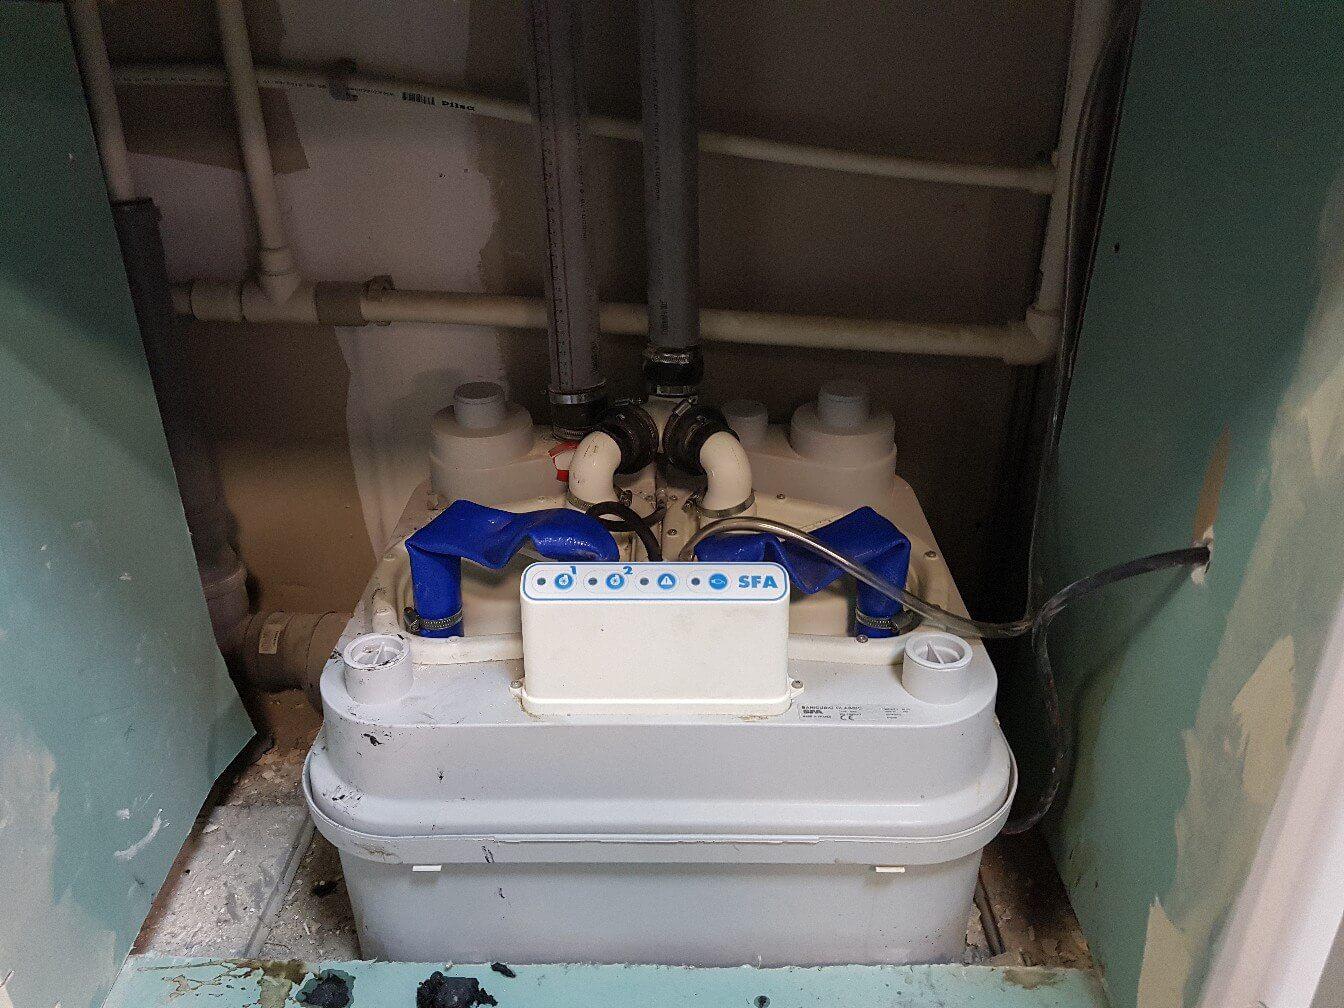 20180505-remont-sanitarnogo-nasosa-sfa-3.jpg